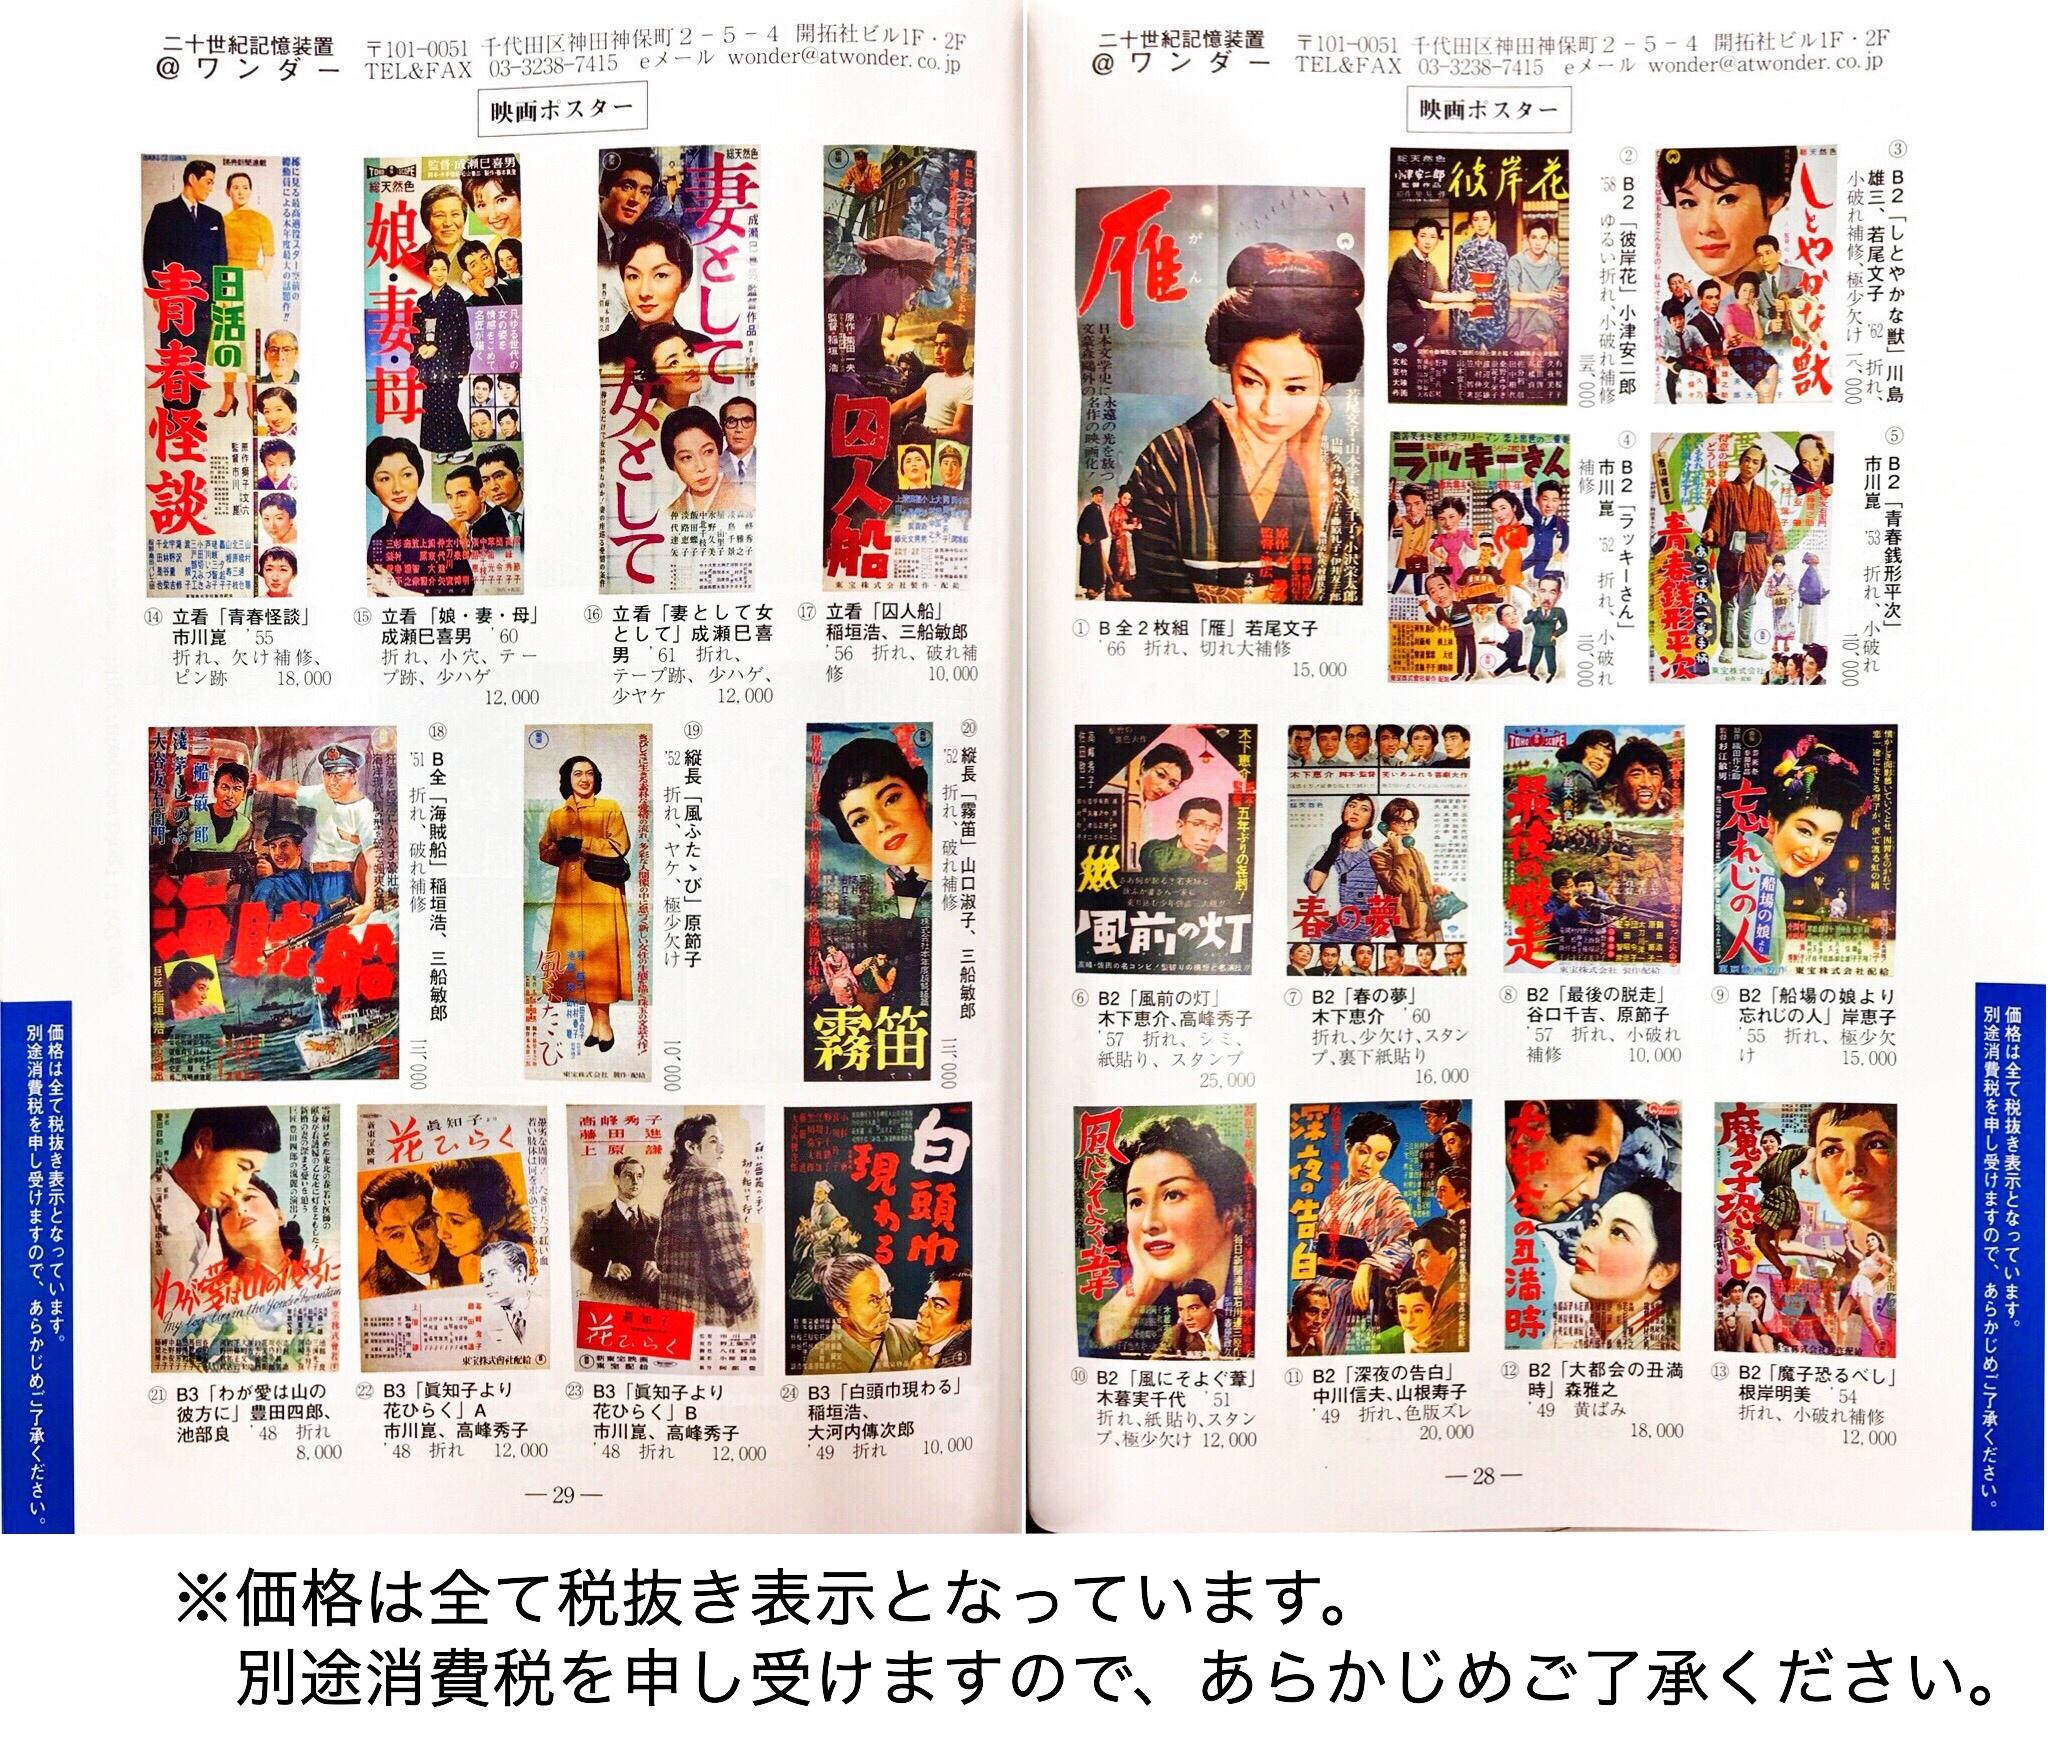 sanseidou201807mokuroku01-02.jpg